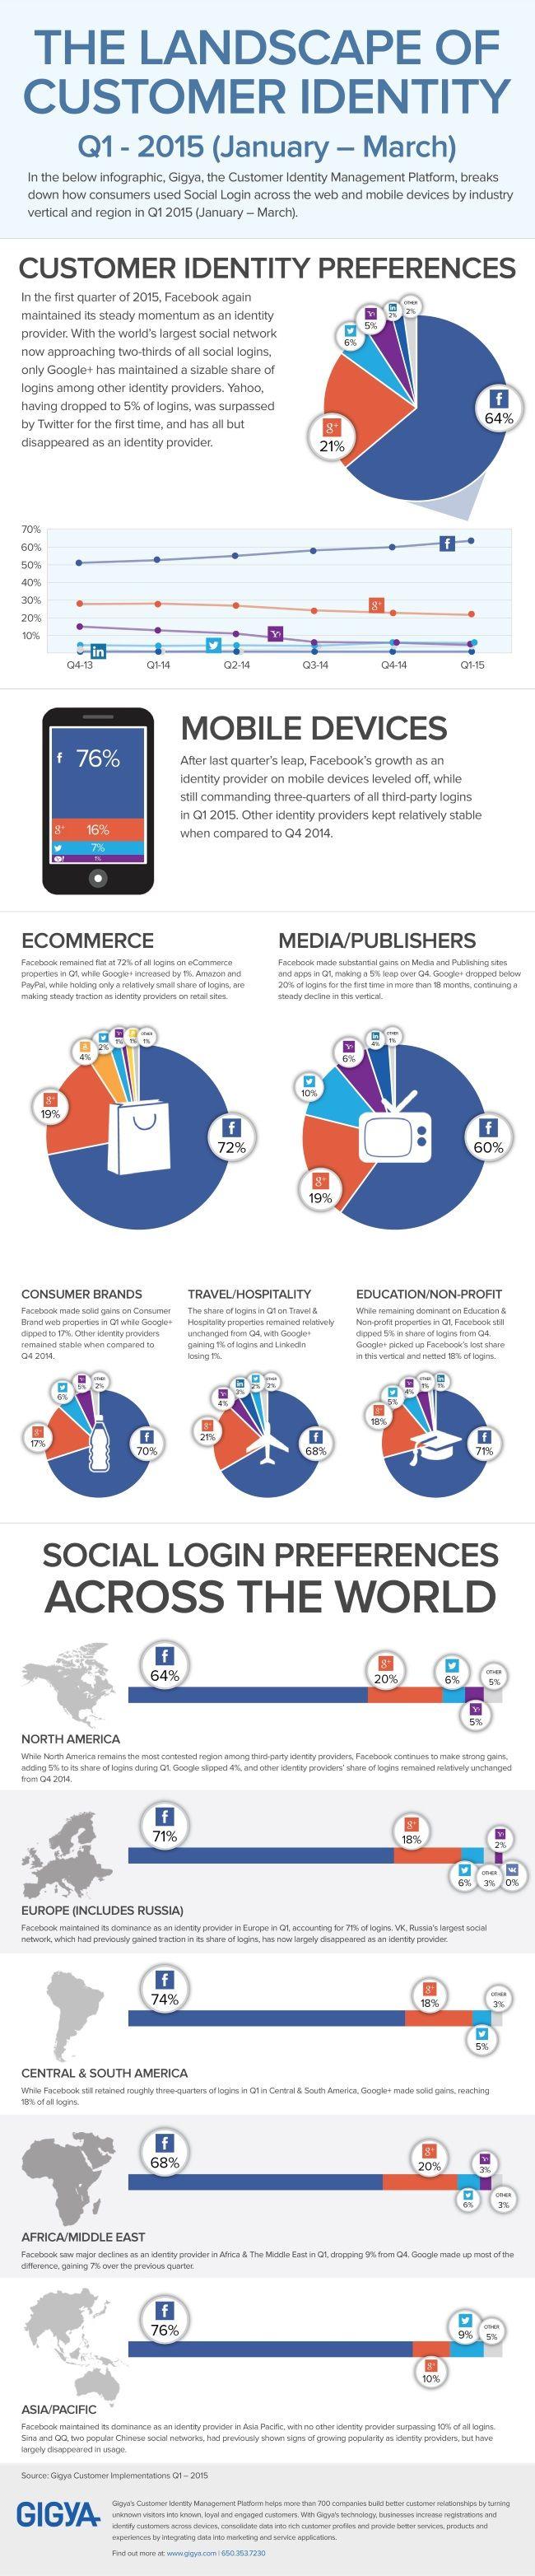 Facebook Near 2/3 of Social Logins; Twitter Tops Yahoo